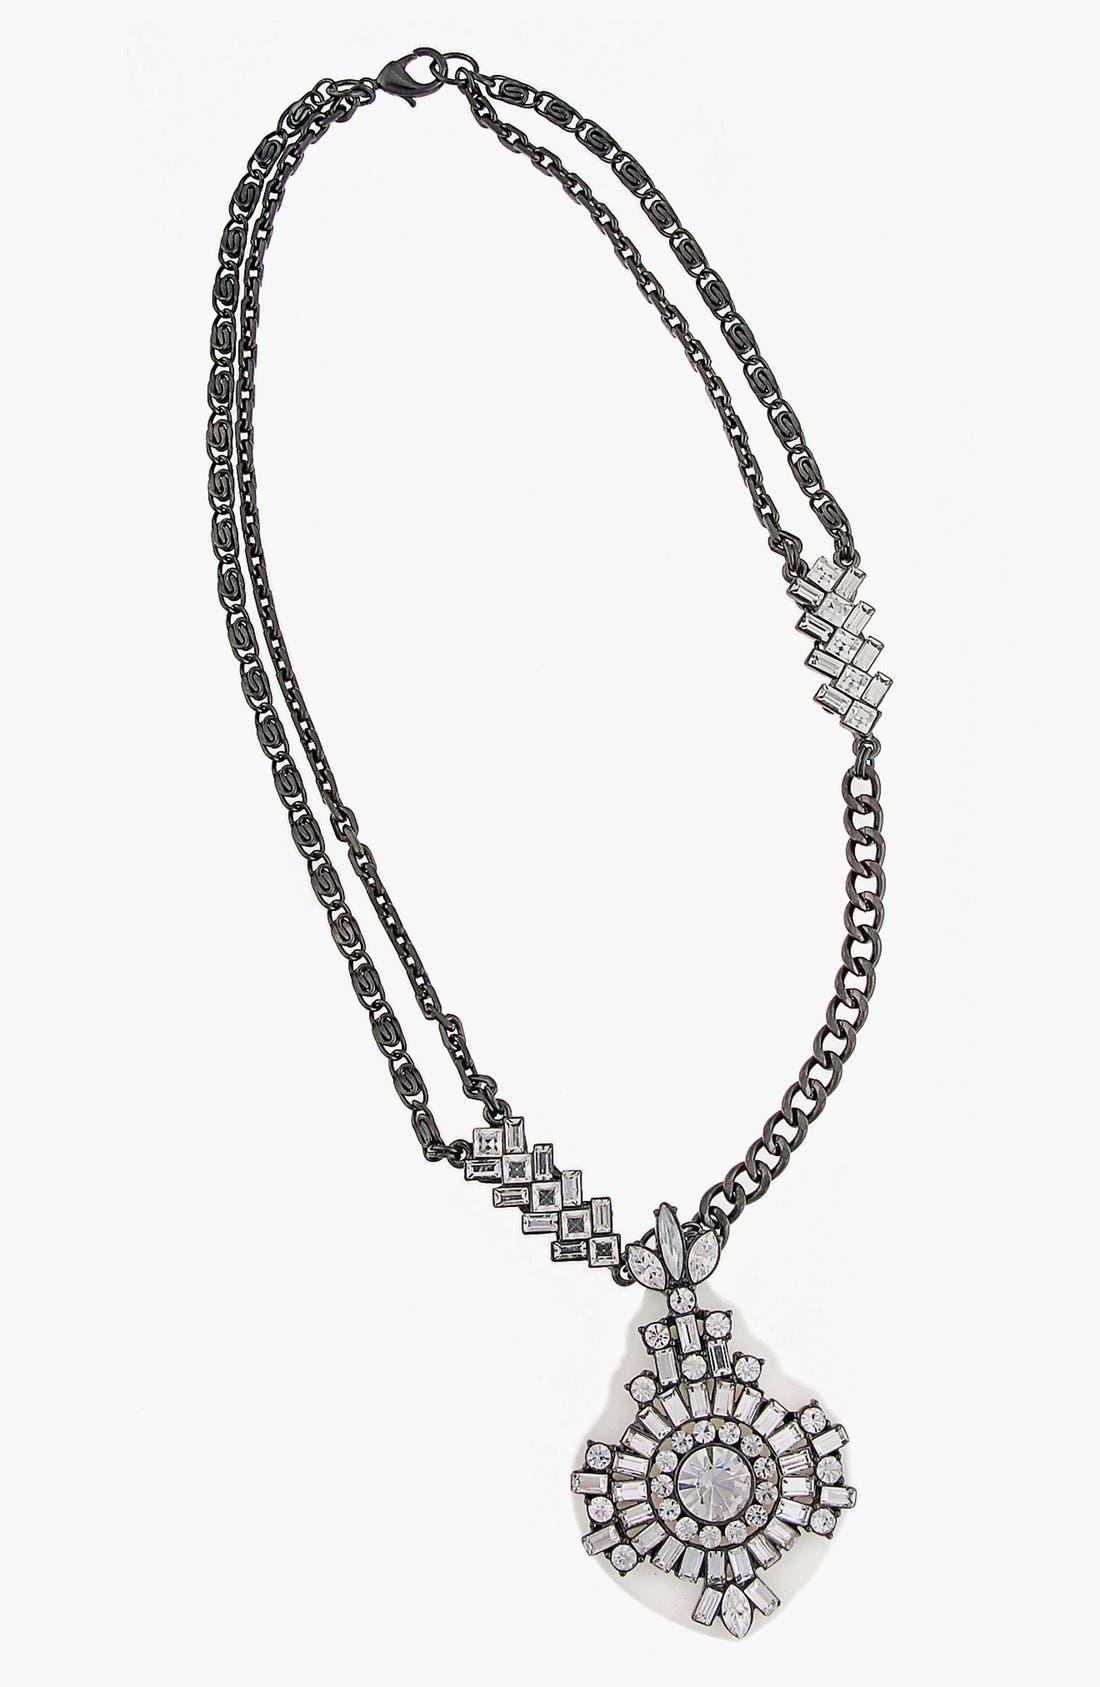 Main Image - Erickson Beamon Rocks 'Heart of Glass' Pendant Necklace